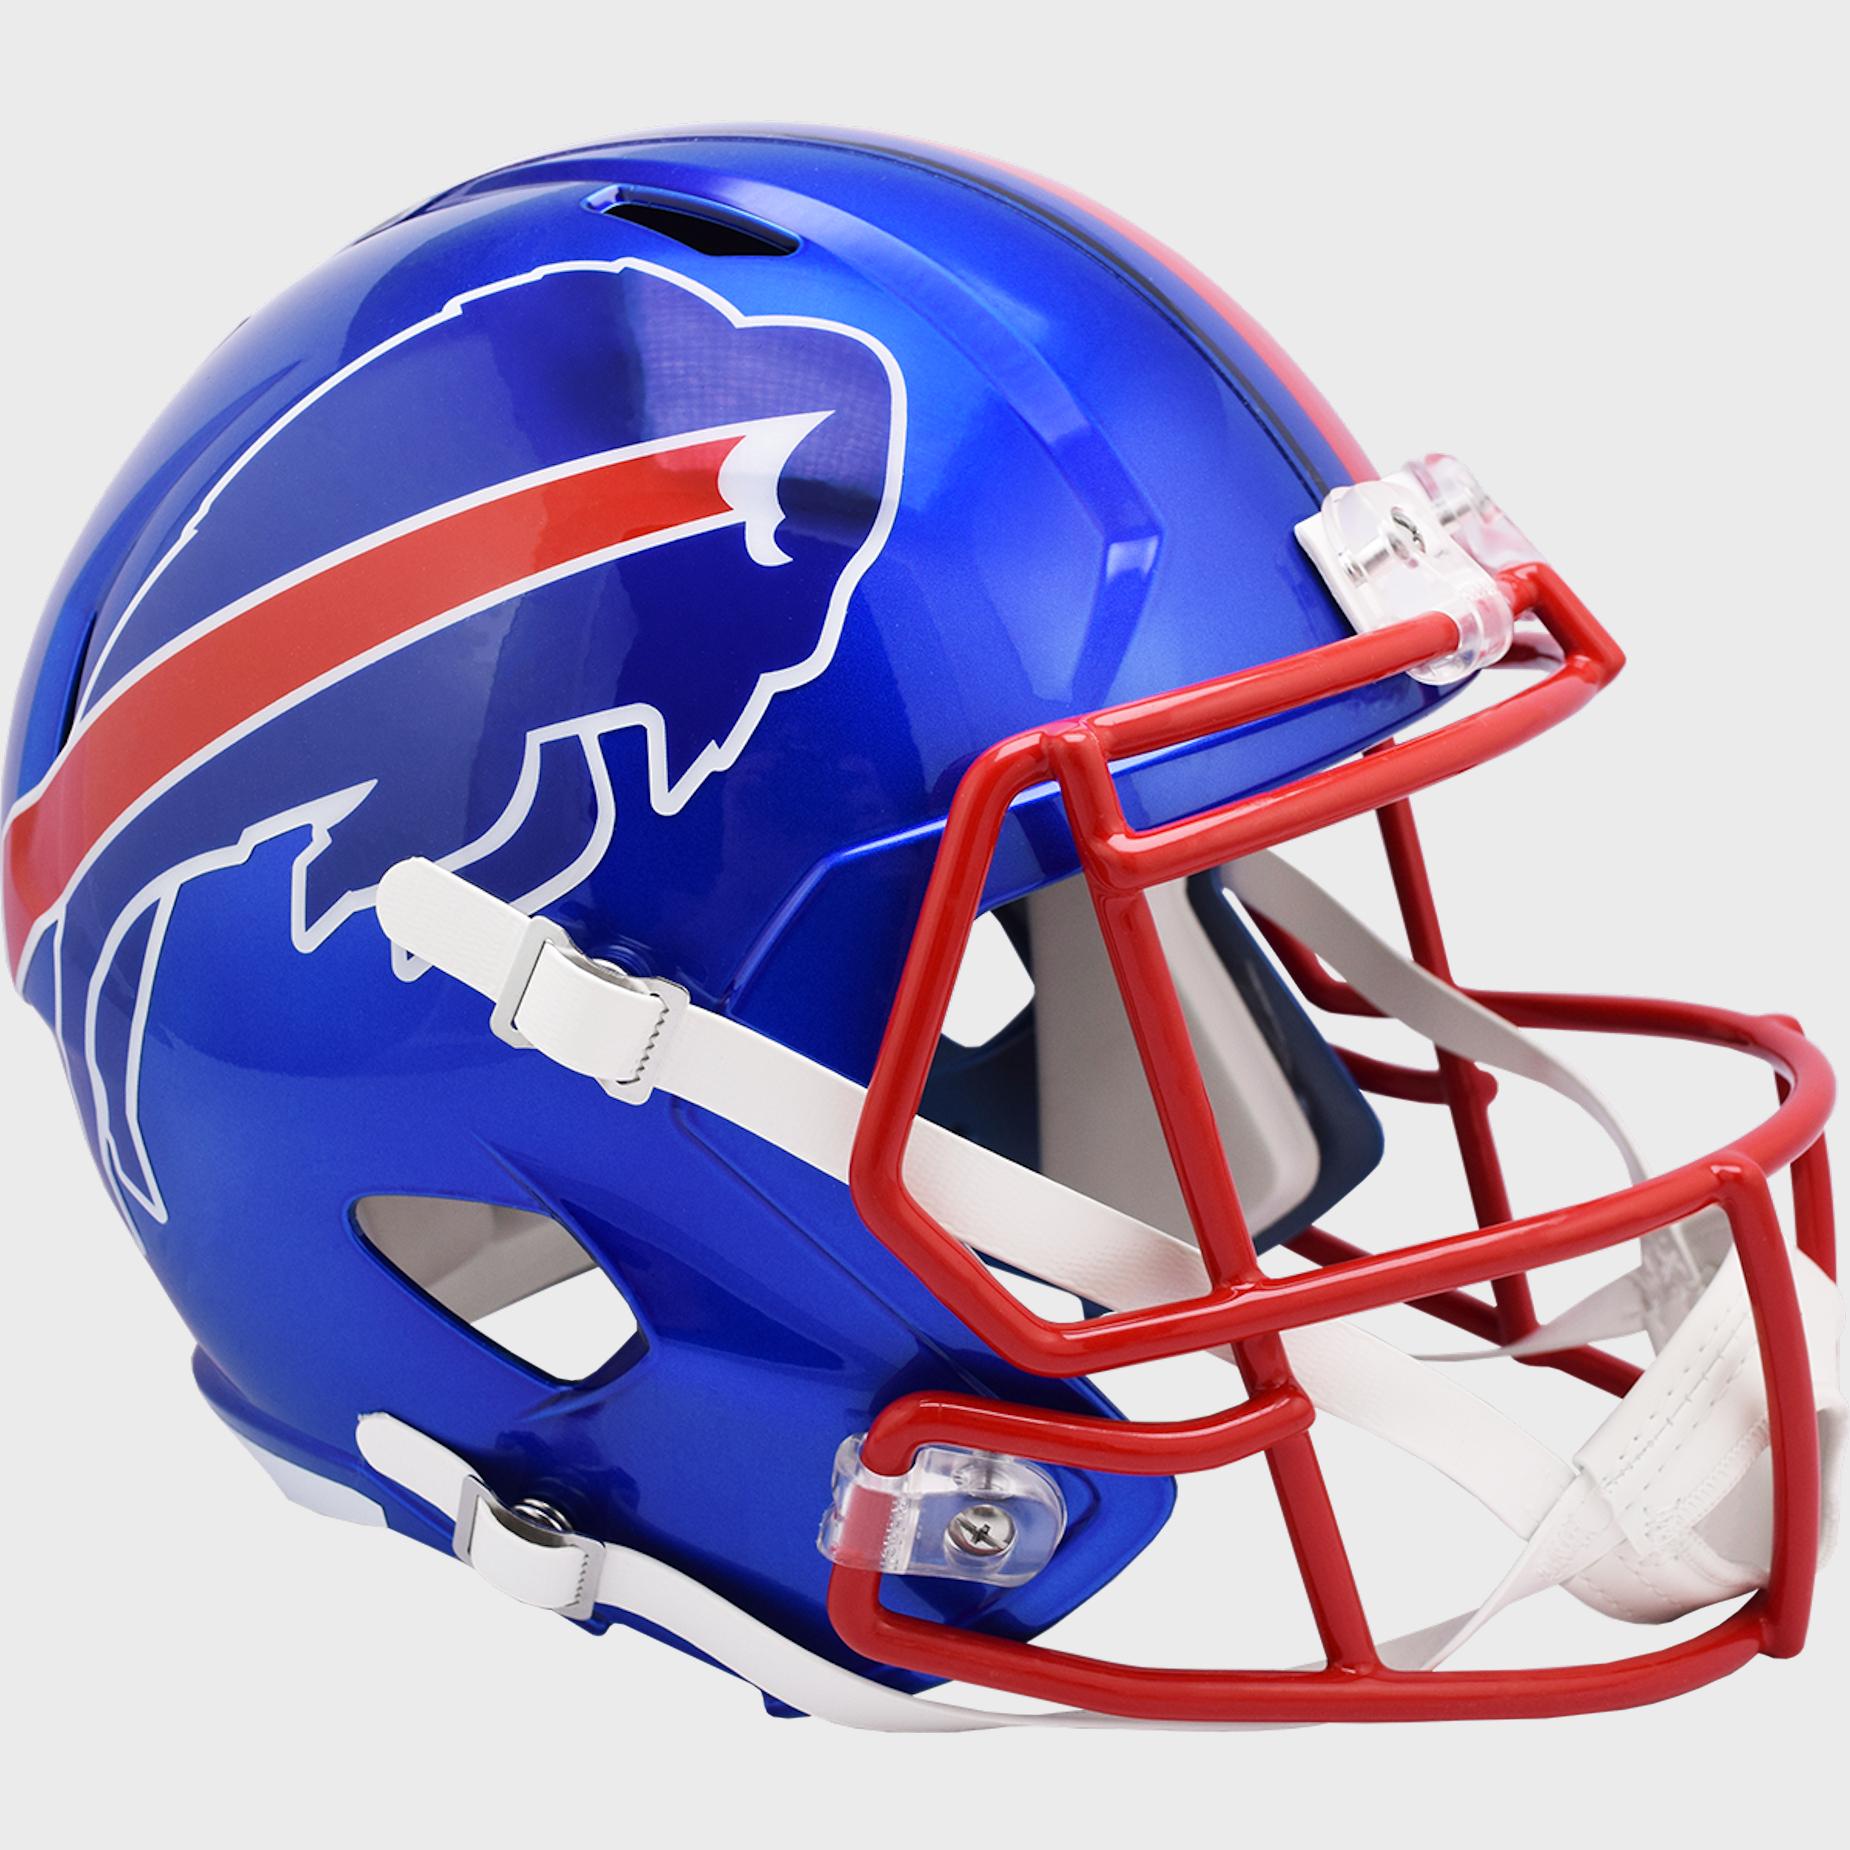 Buffalo Bills Speed Replica Football Helmet <B>FLASH ESD 8/21/21</B>